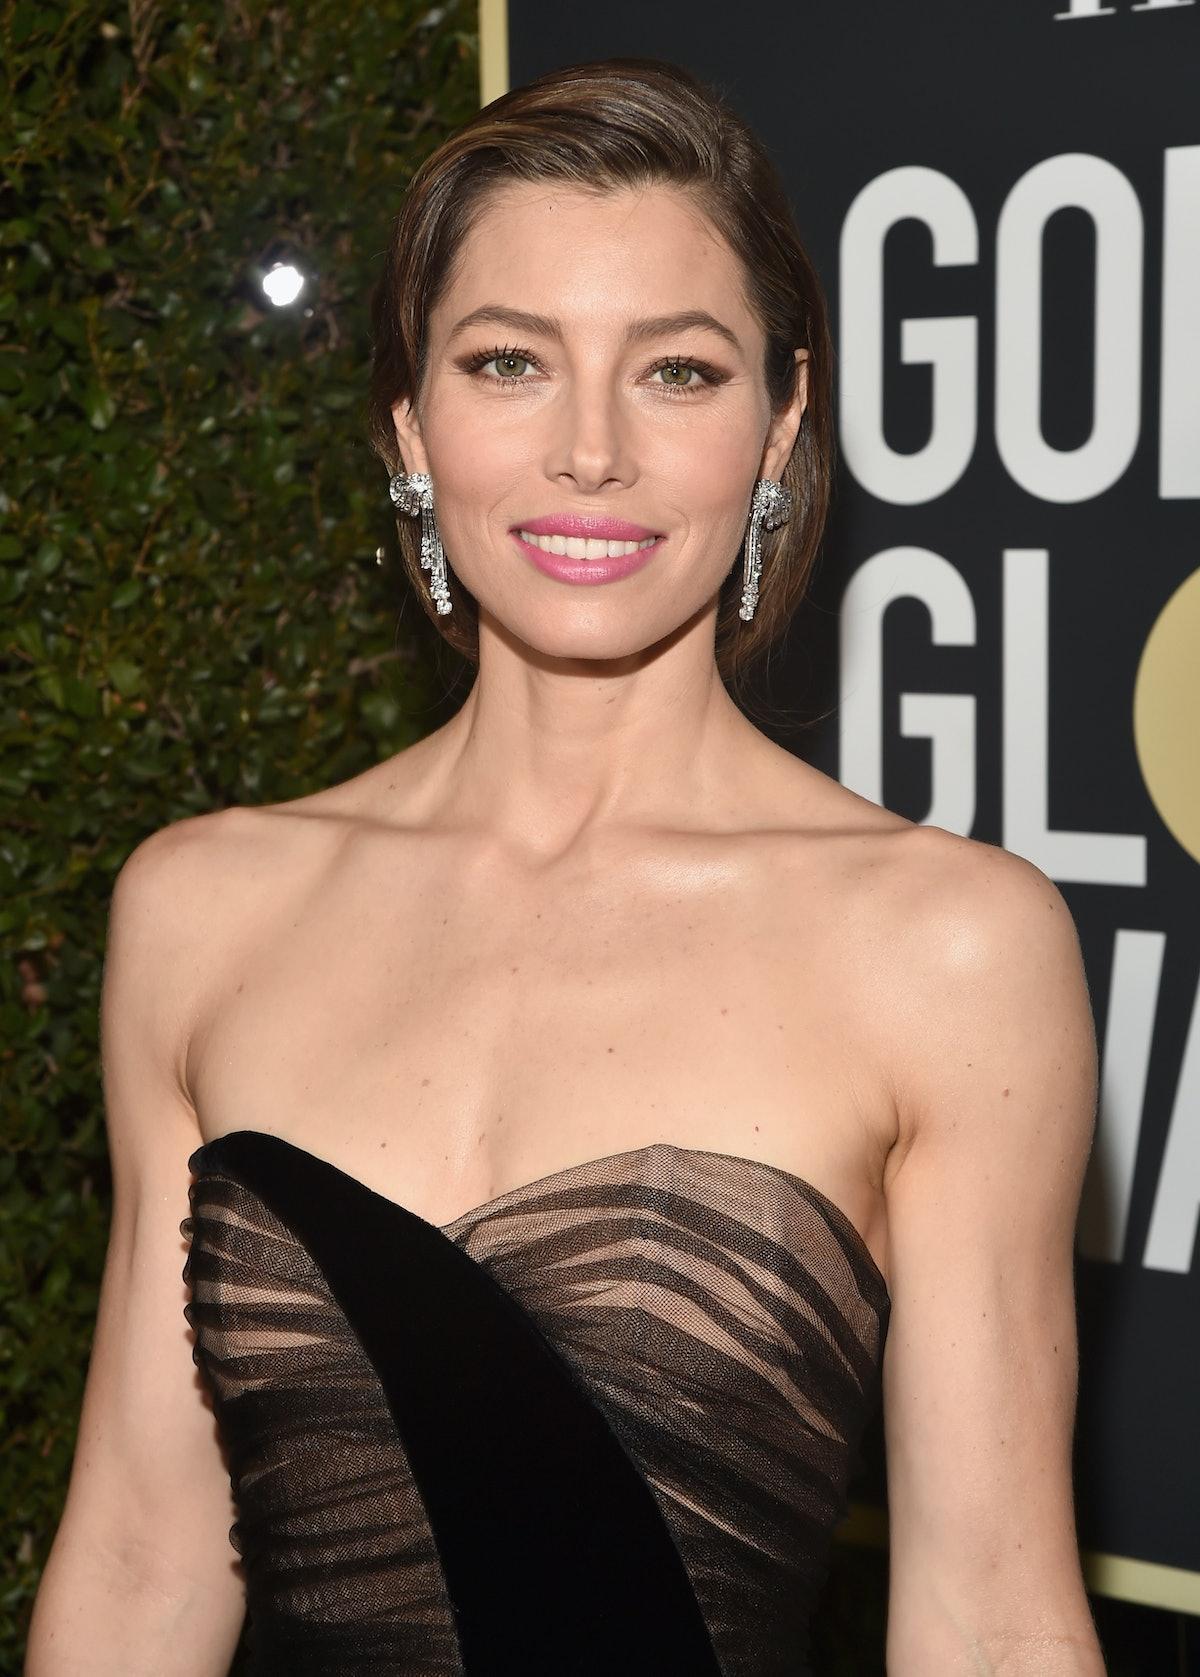 75th Annual Golden Globe Awards - Executive Arrivals